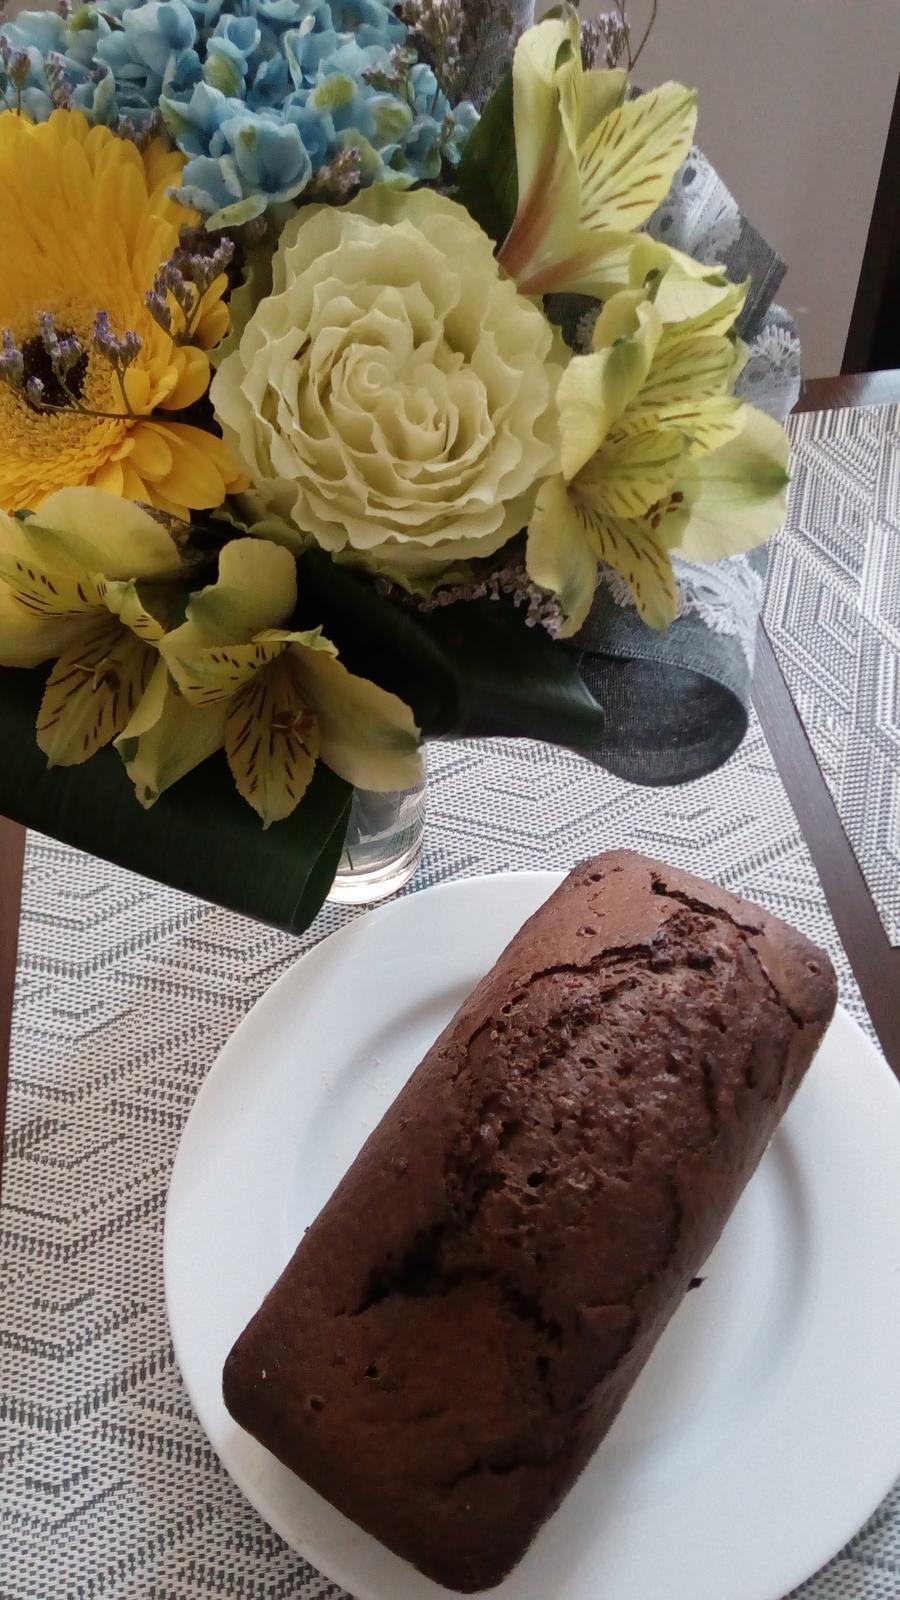 Hokus pokus v kuchyni - Cuketovo-čokoládový chlebíček